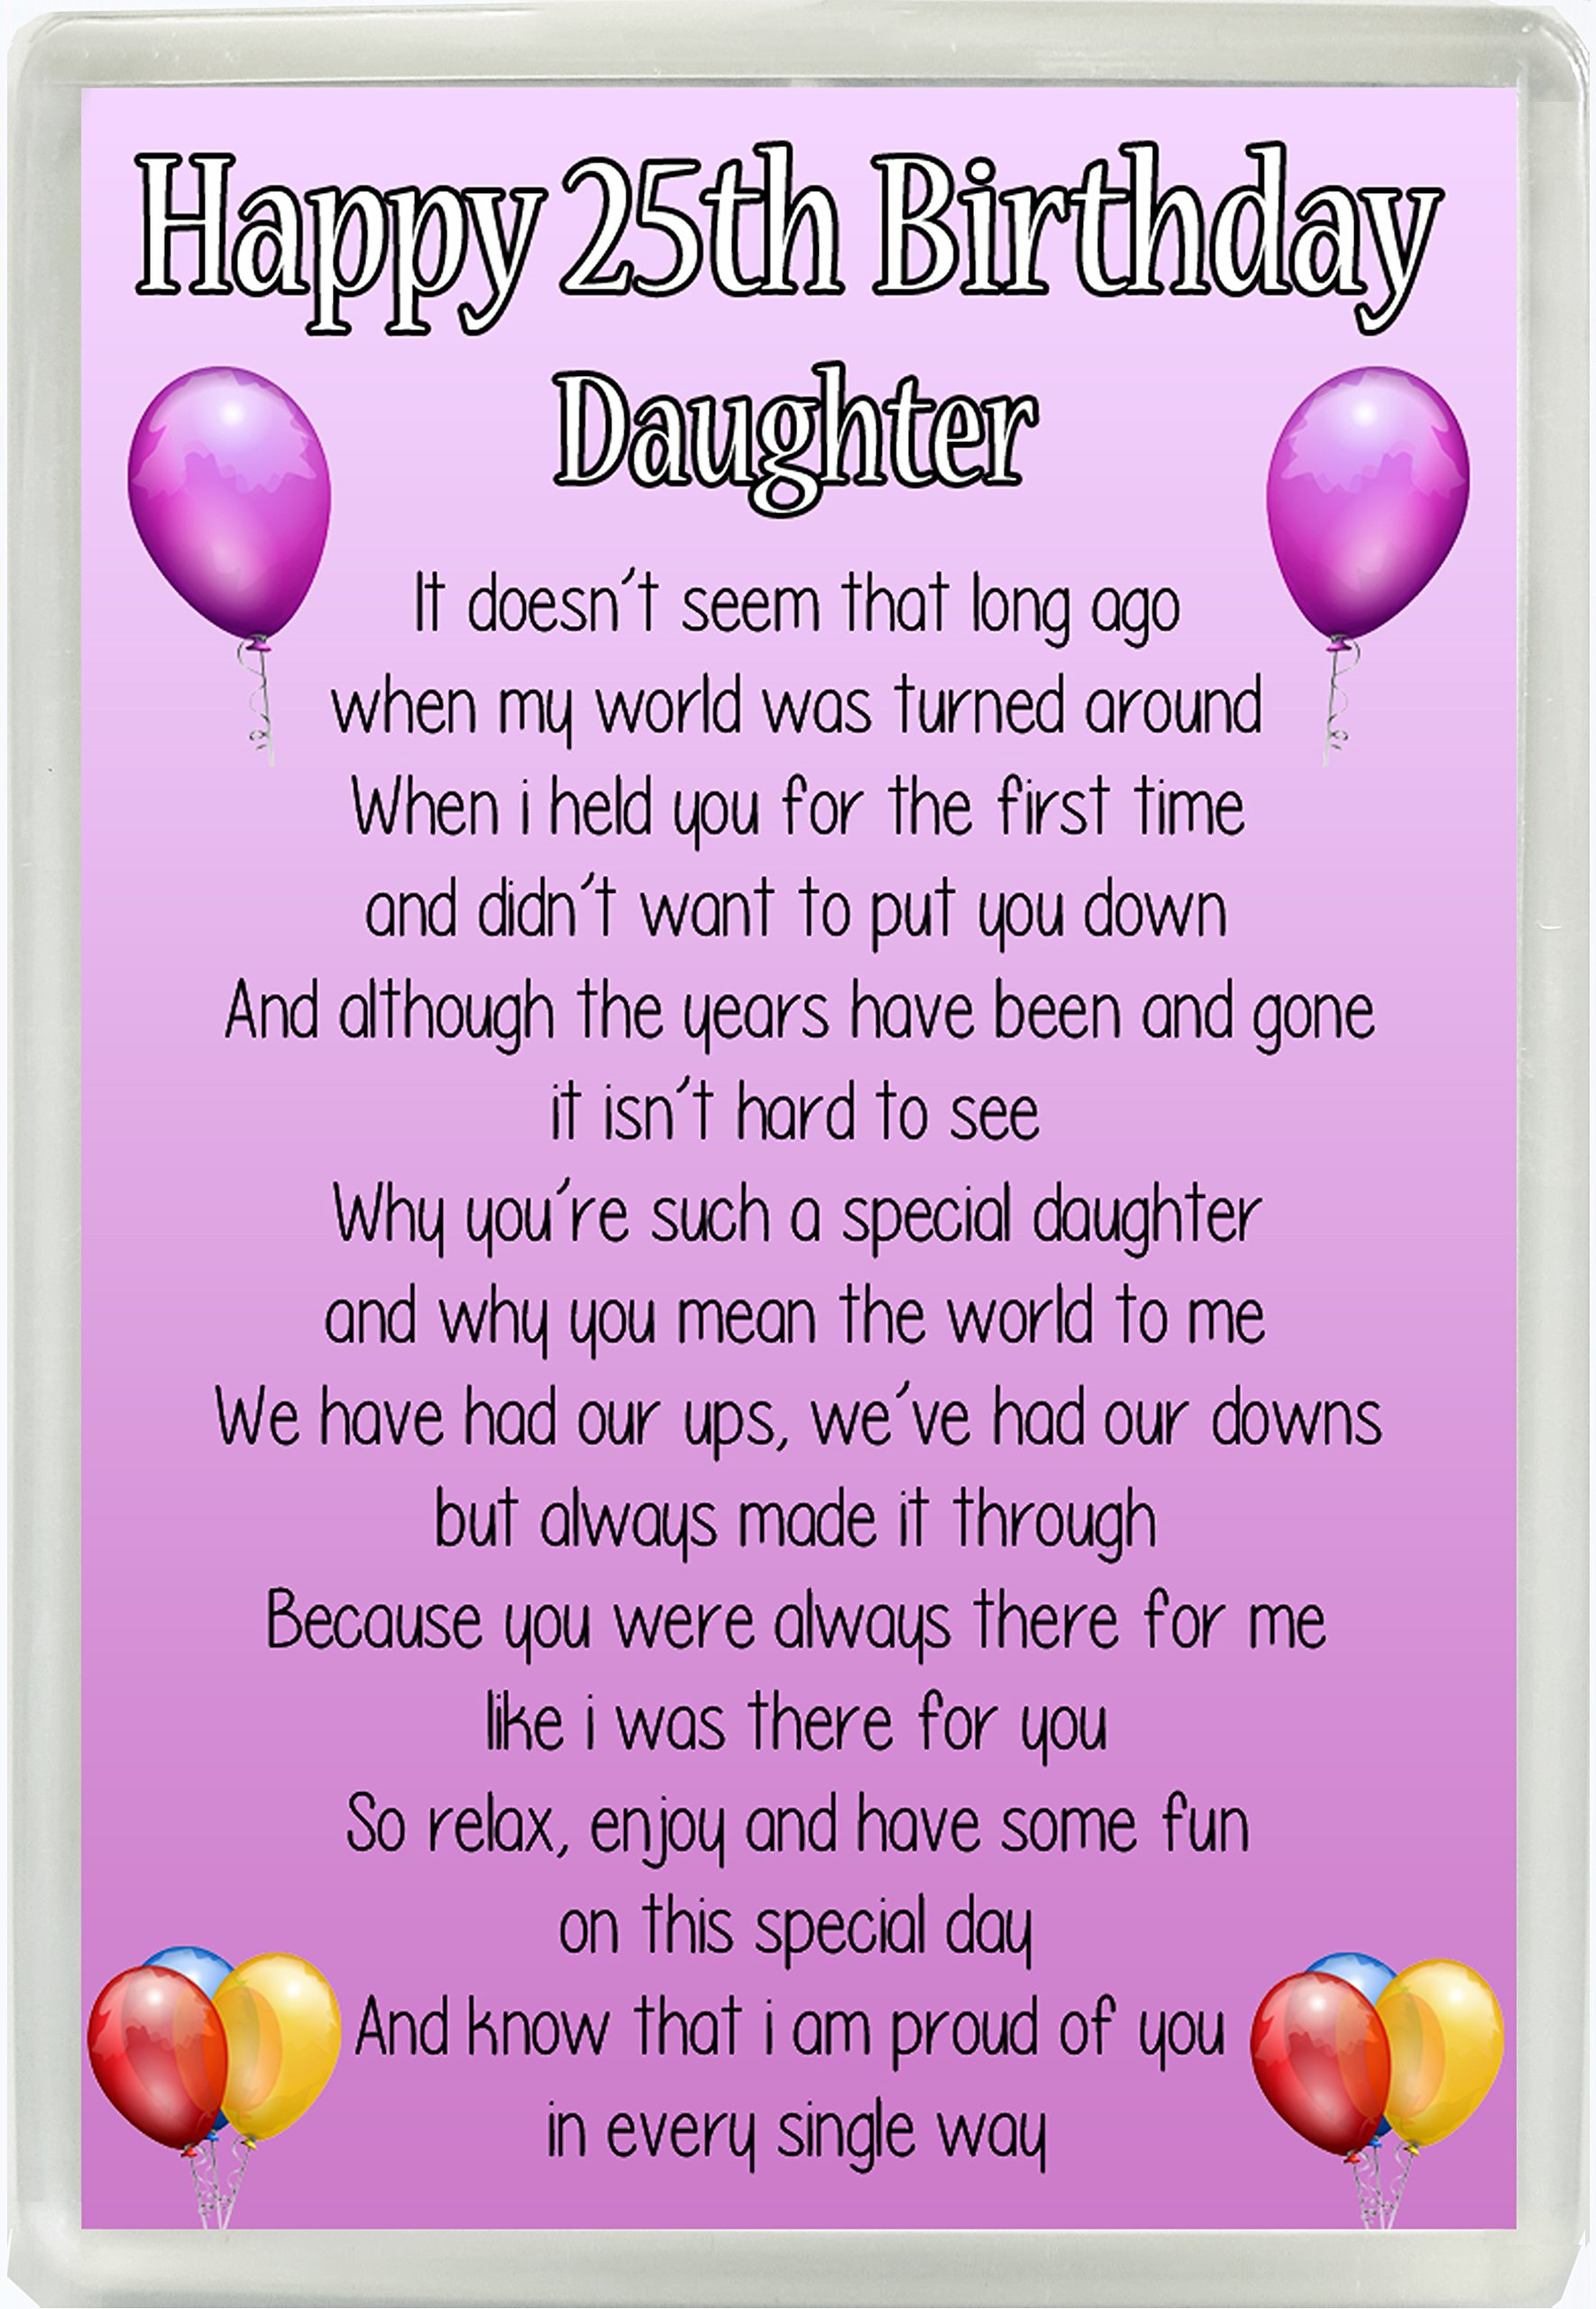 Happy 25th Birthday Daughter Poem Jumbo Fridge Magnet Ideal Birthday Gift M95